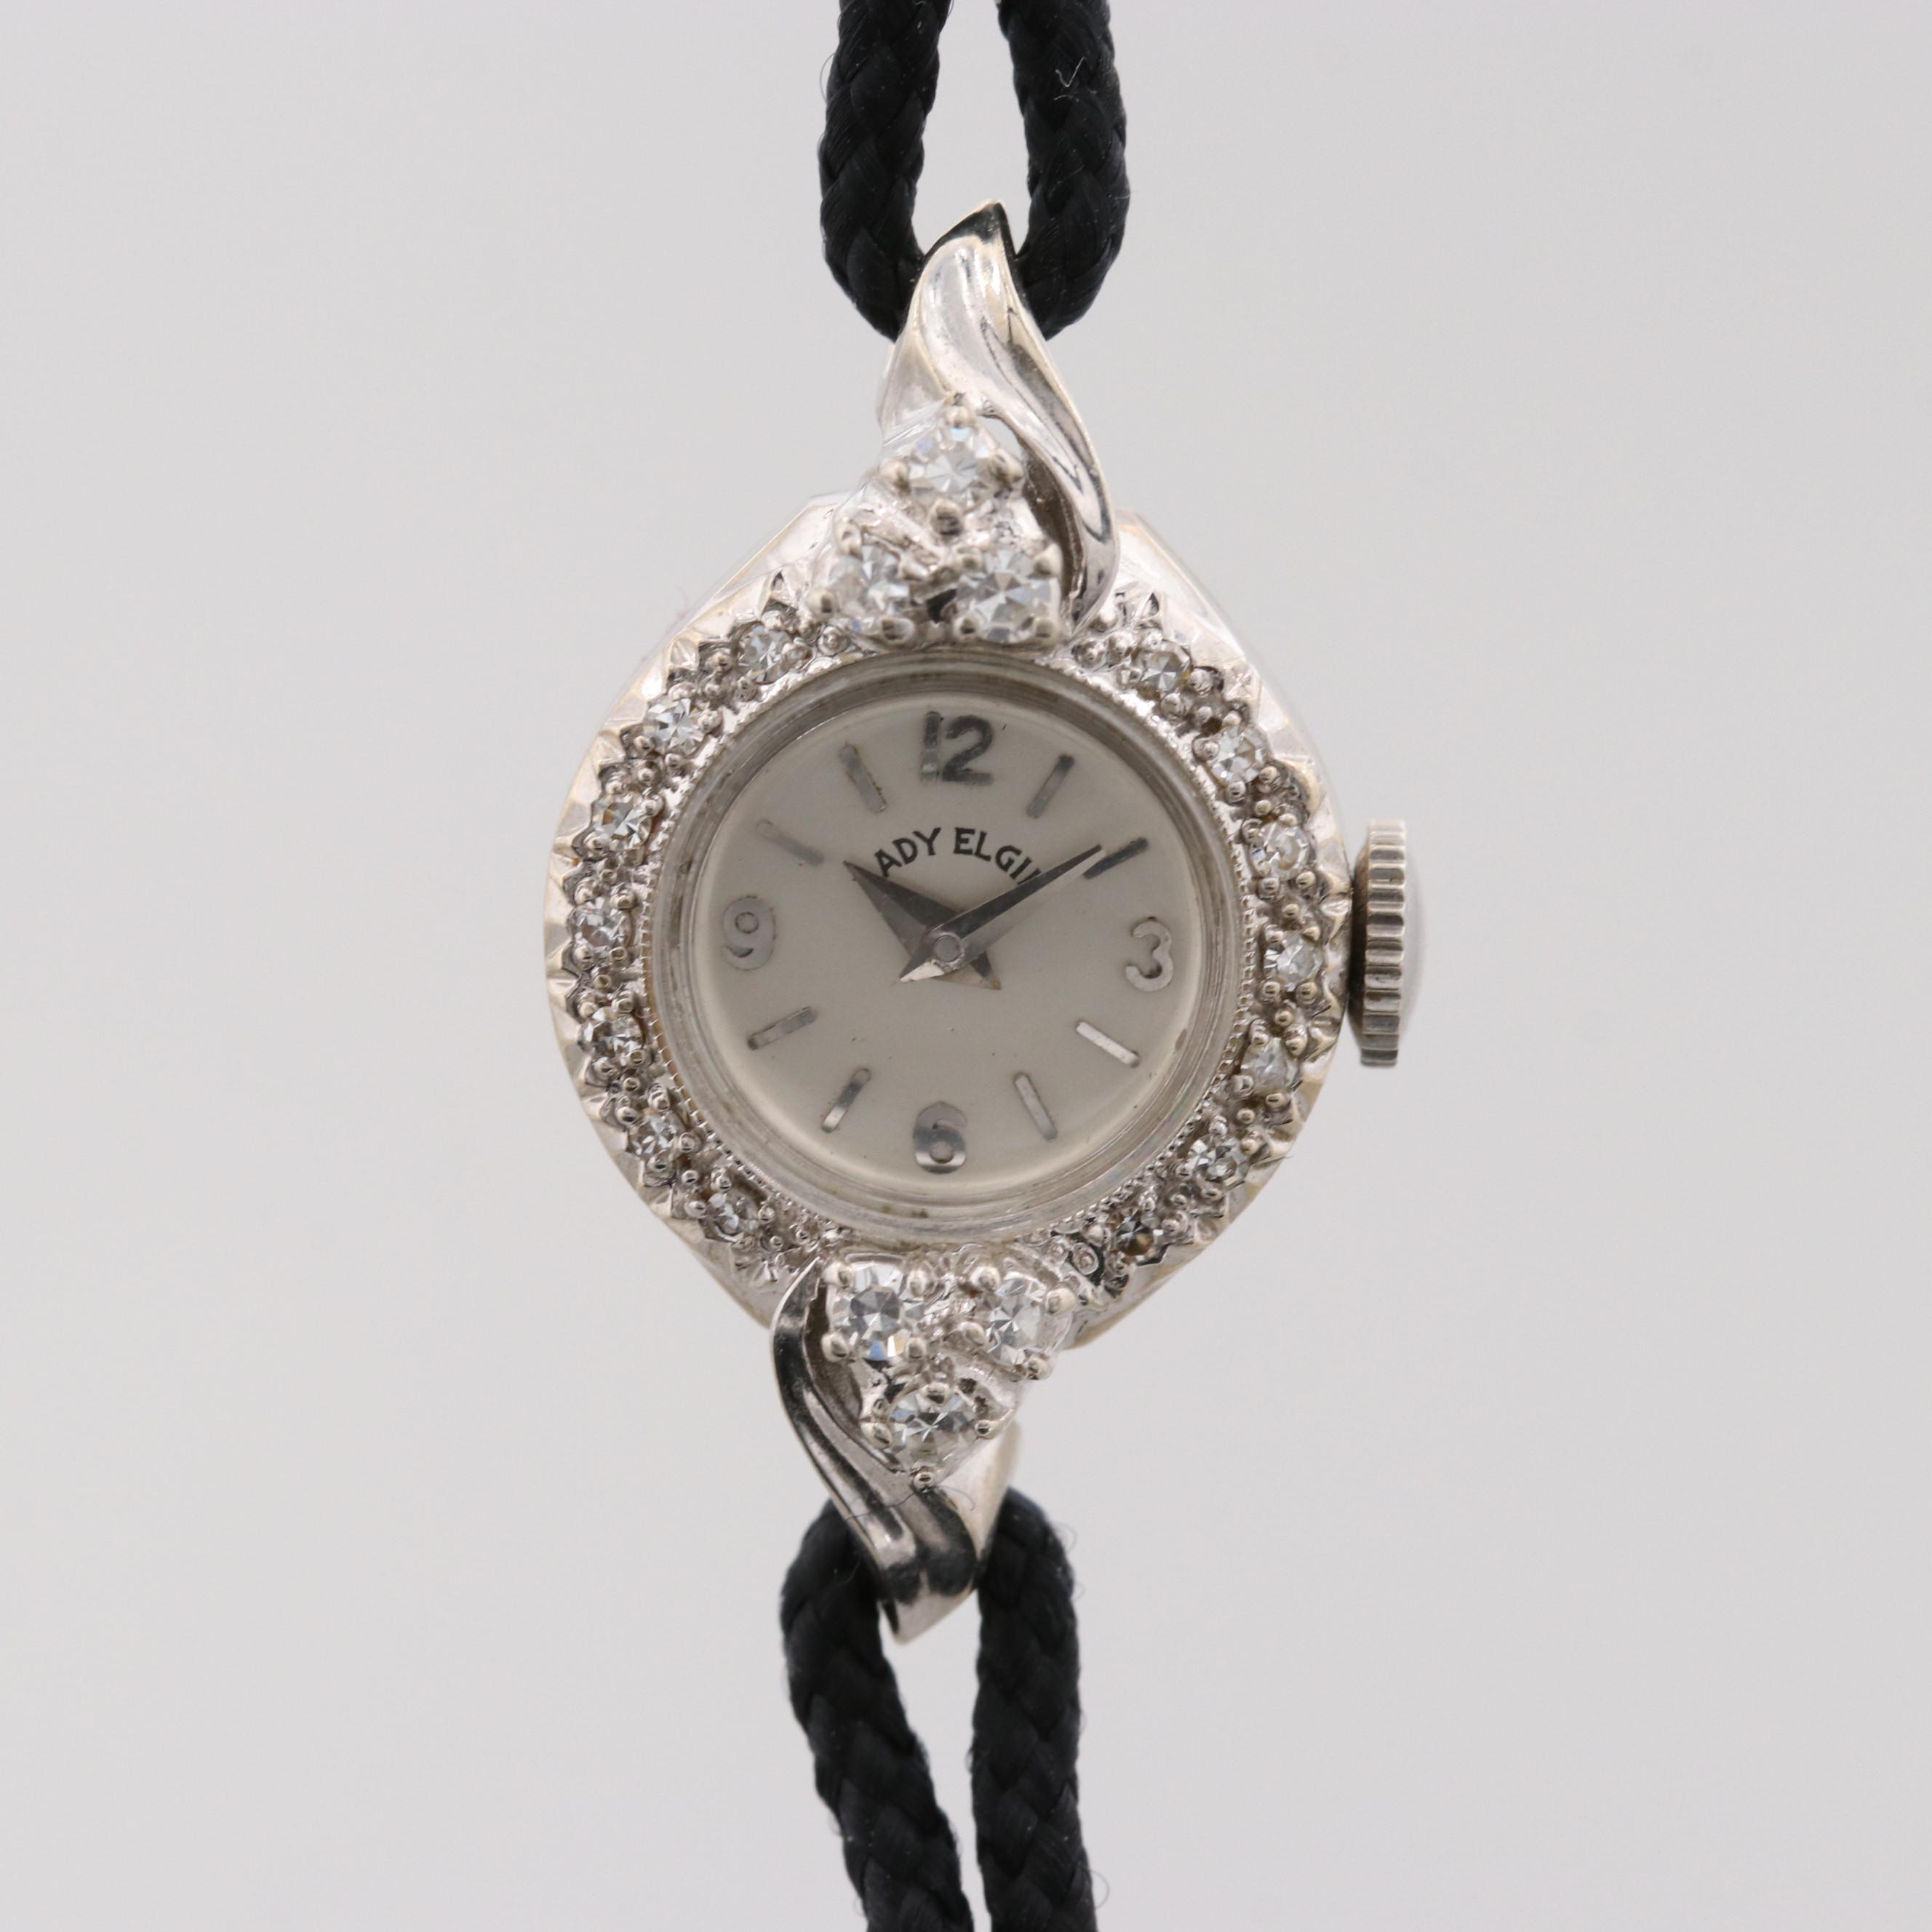 Vintage Lady Elgin 14K White Gold Diamond Wristwatch